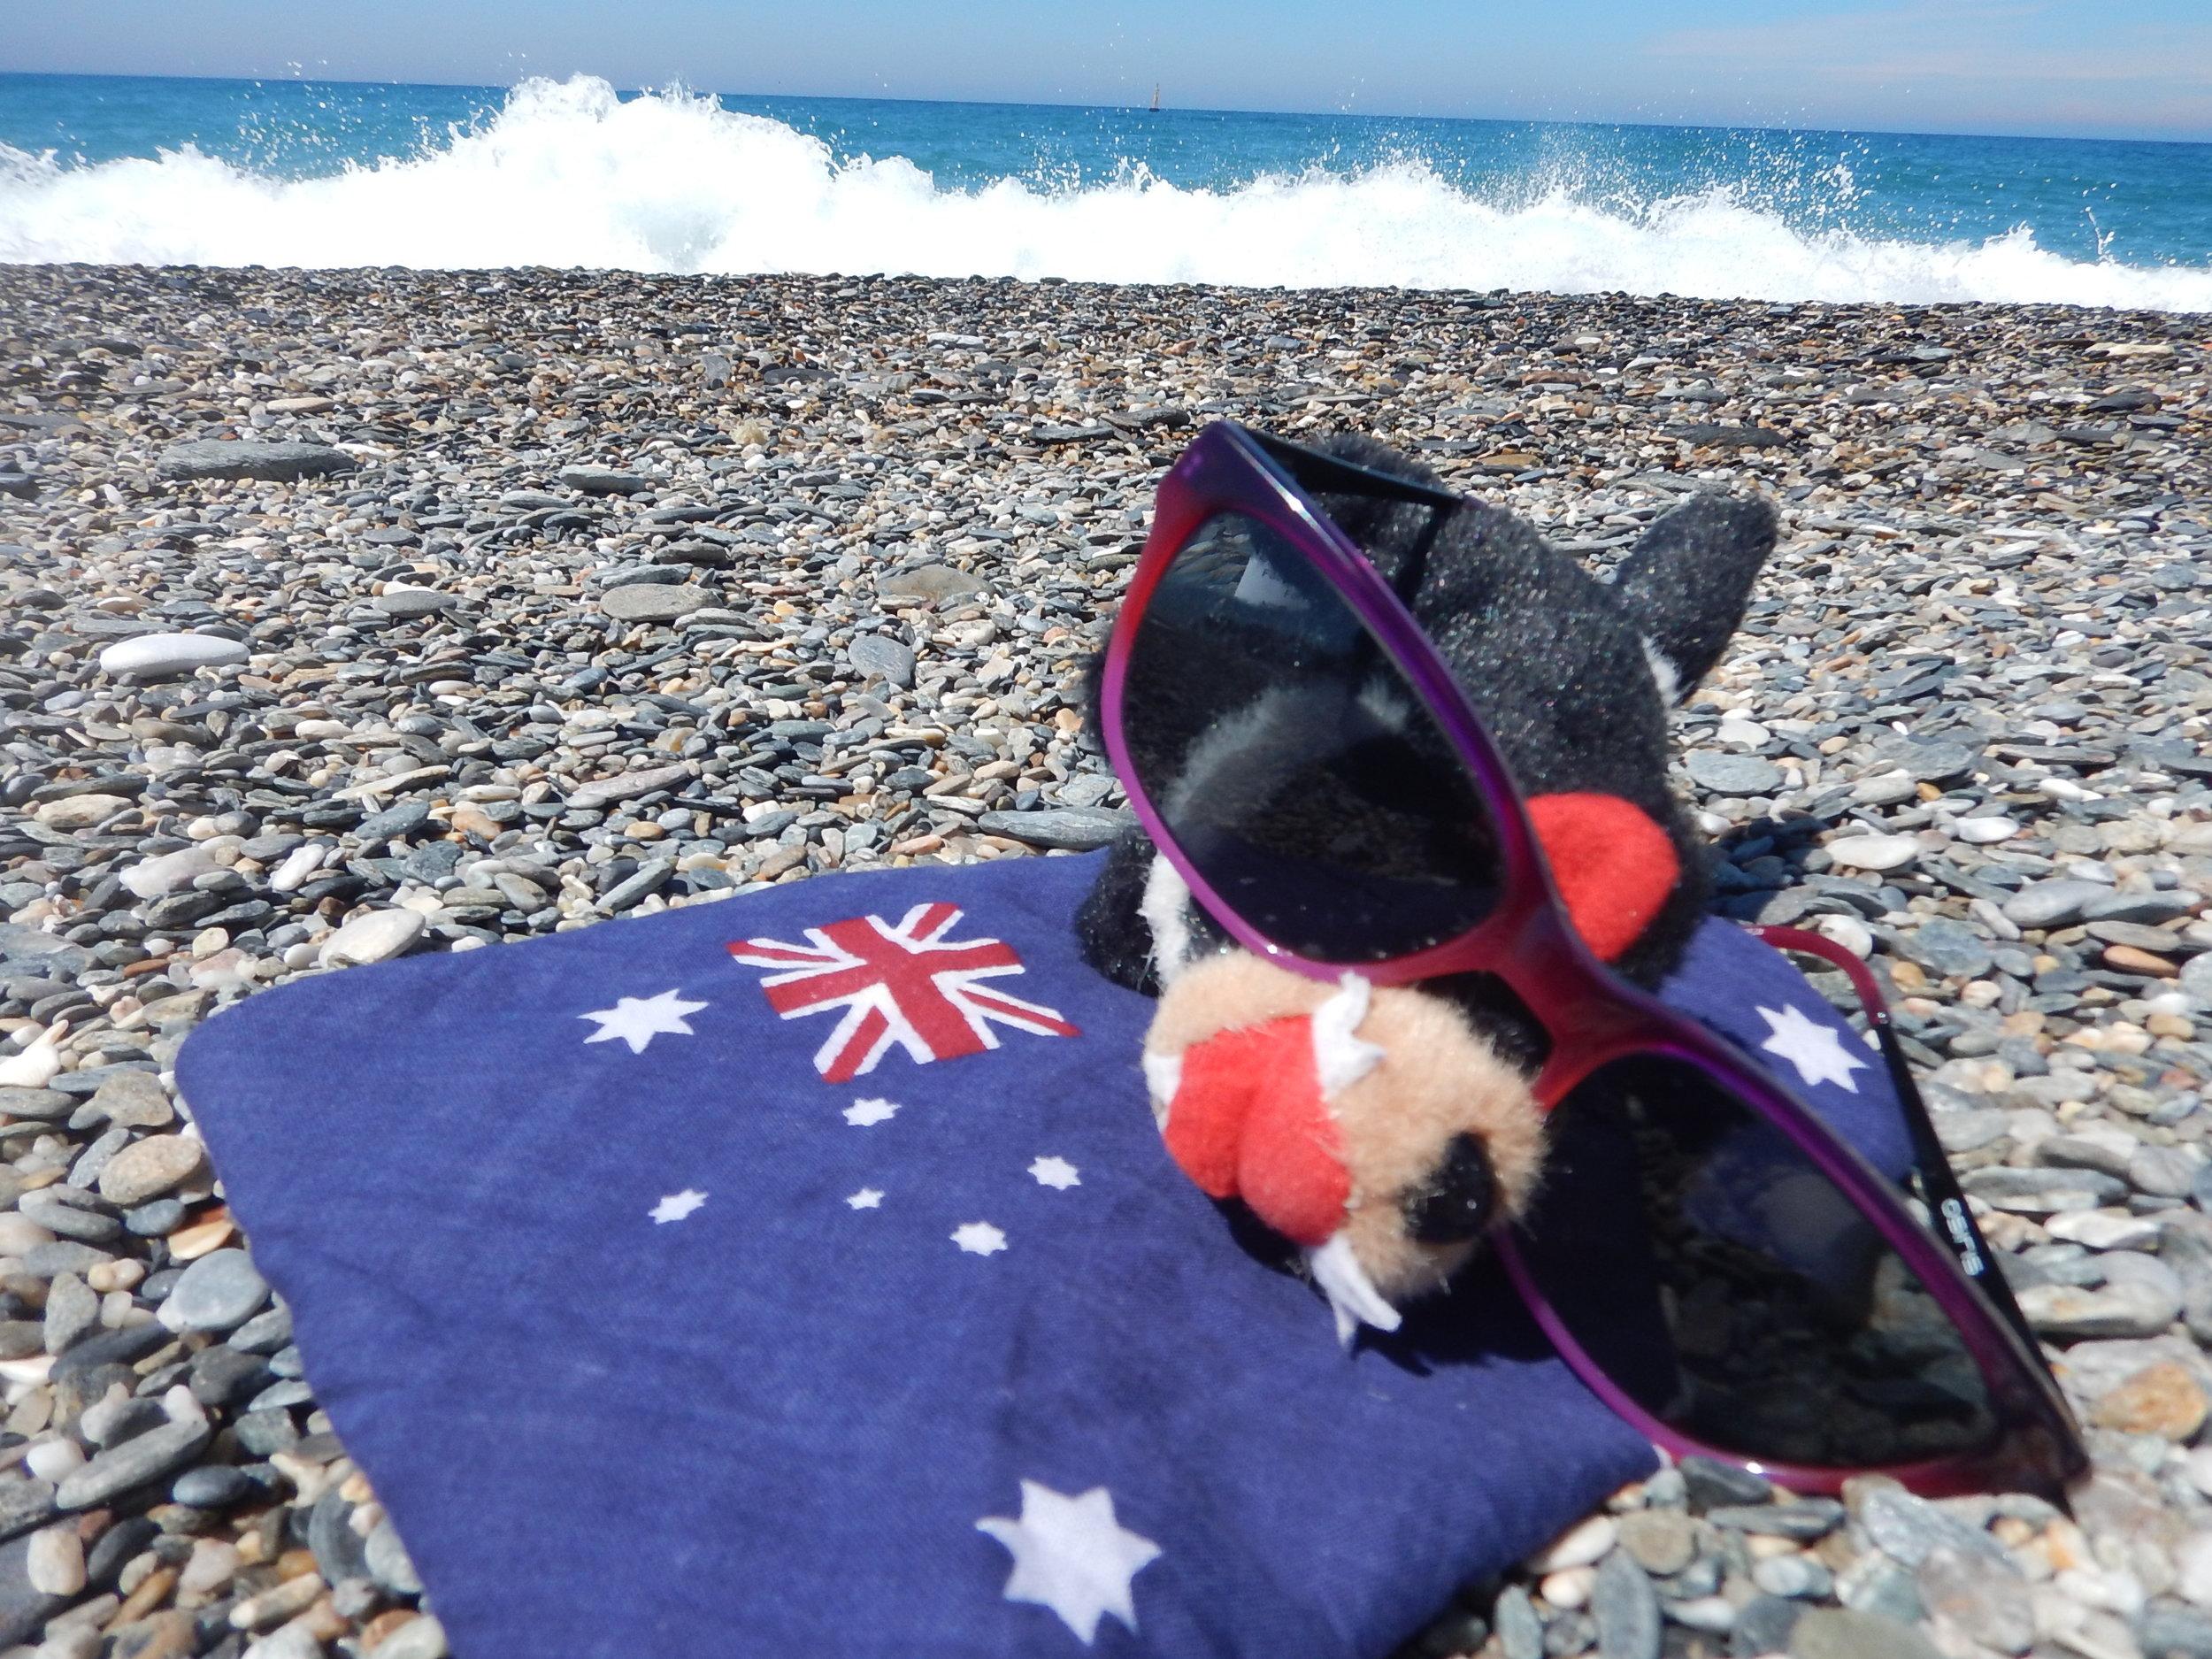 Harri catching a few rays on his Aussie beach towel.